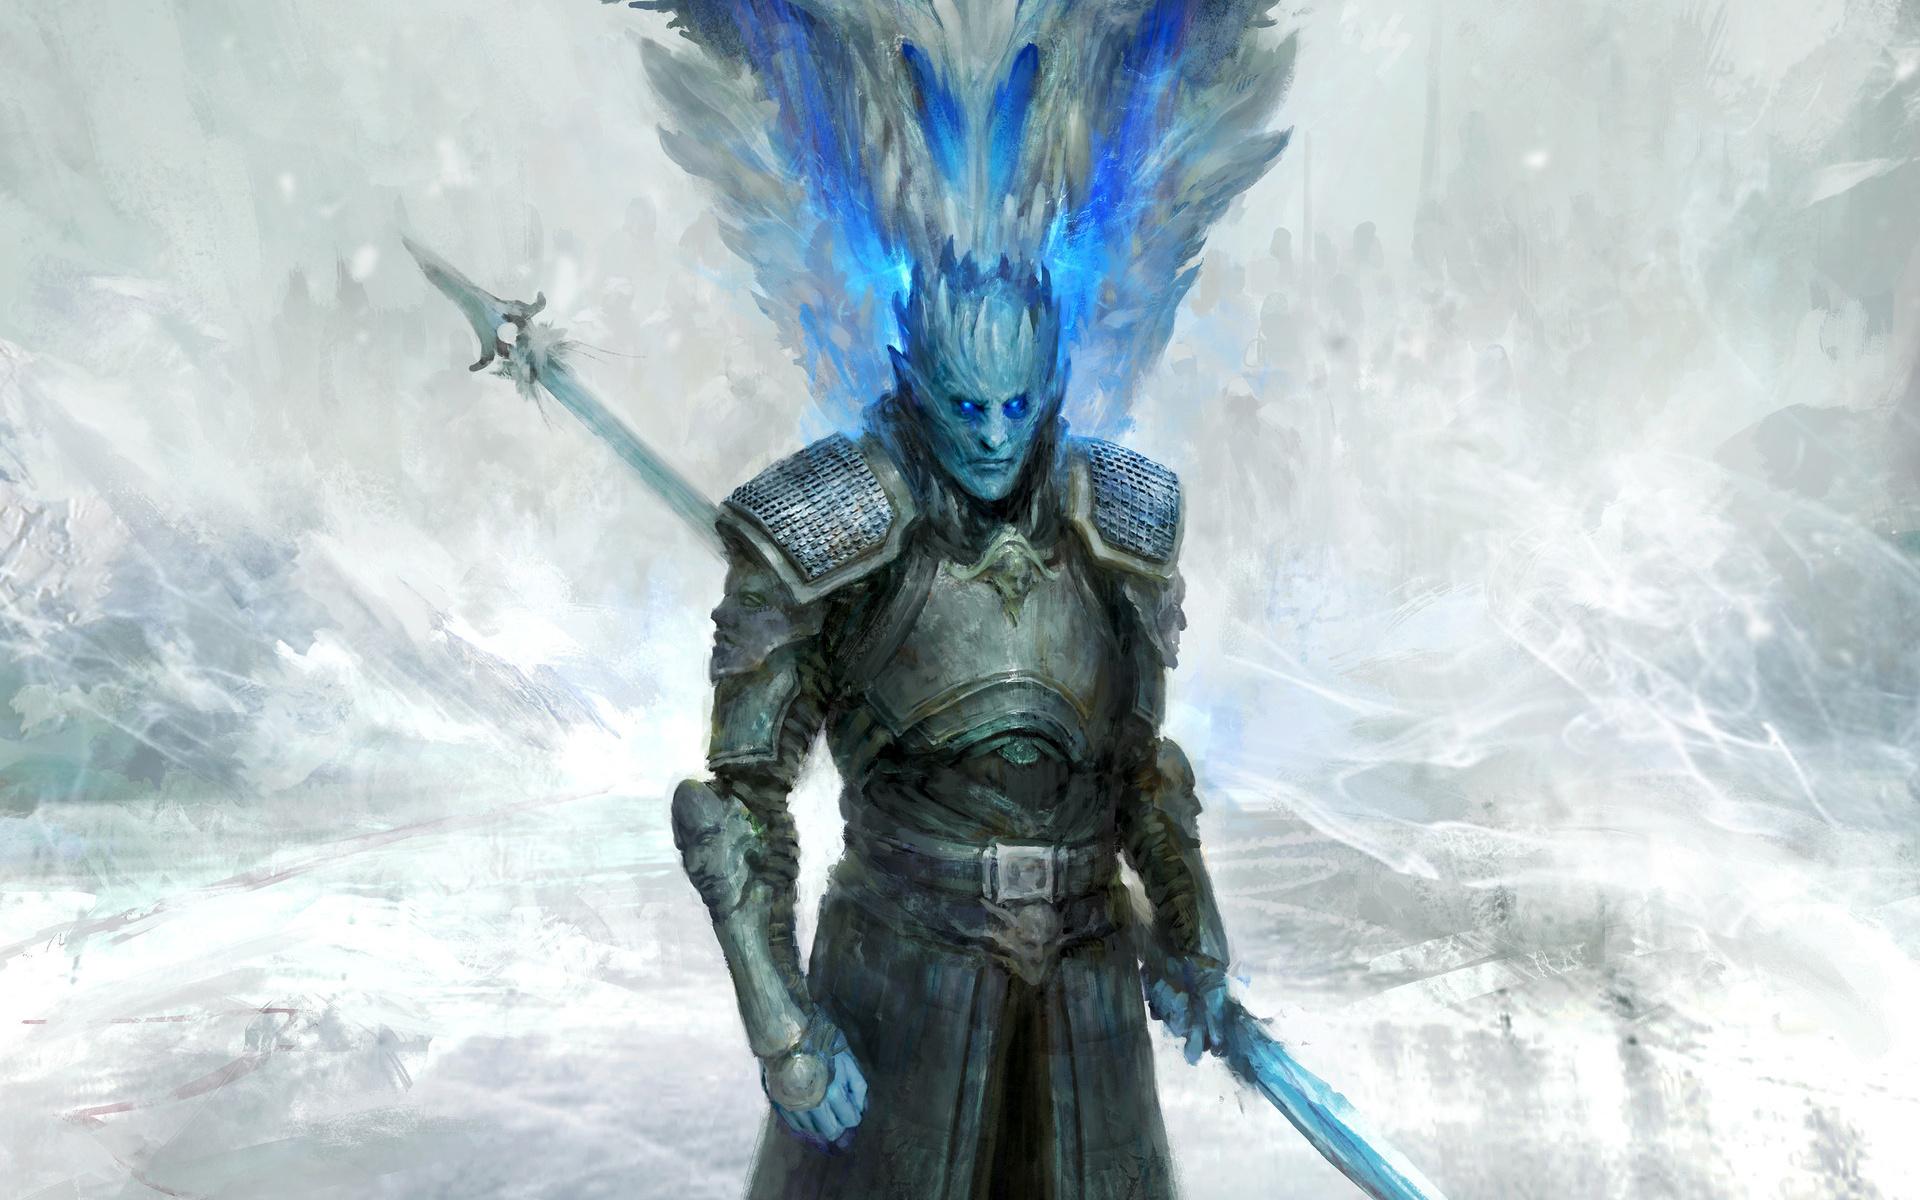 White Walker, Knight King, Dragon, Game Of Thrones, - White Walker King Hd - HD Wallpaper